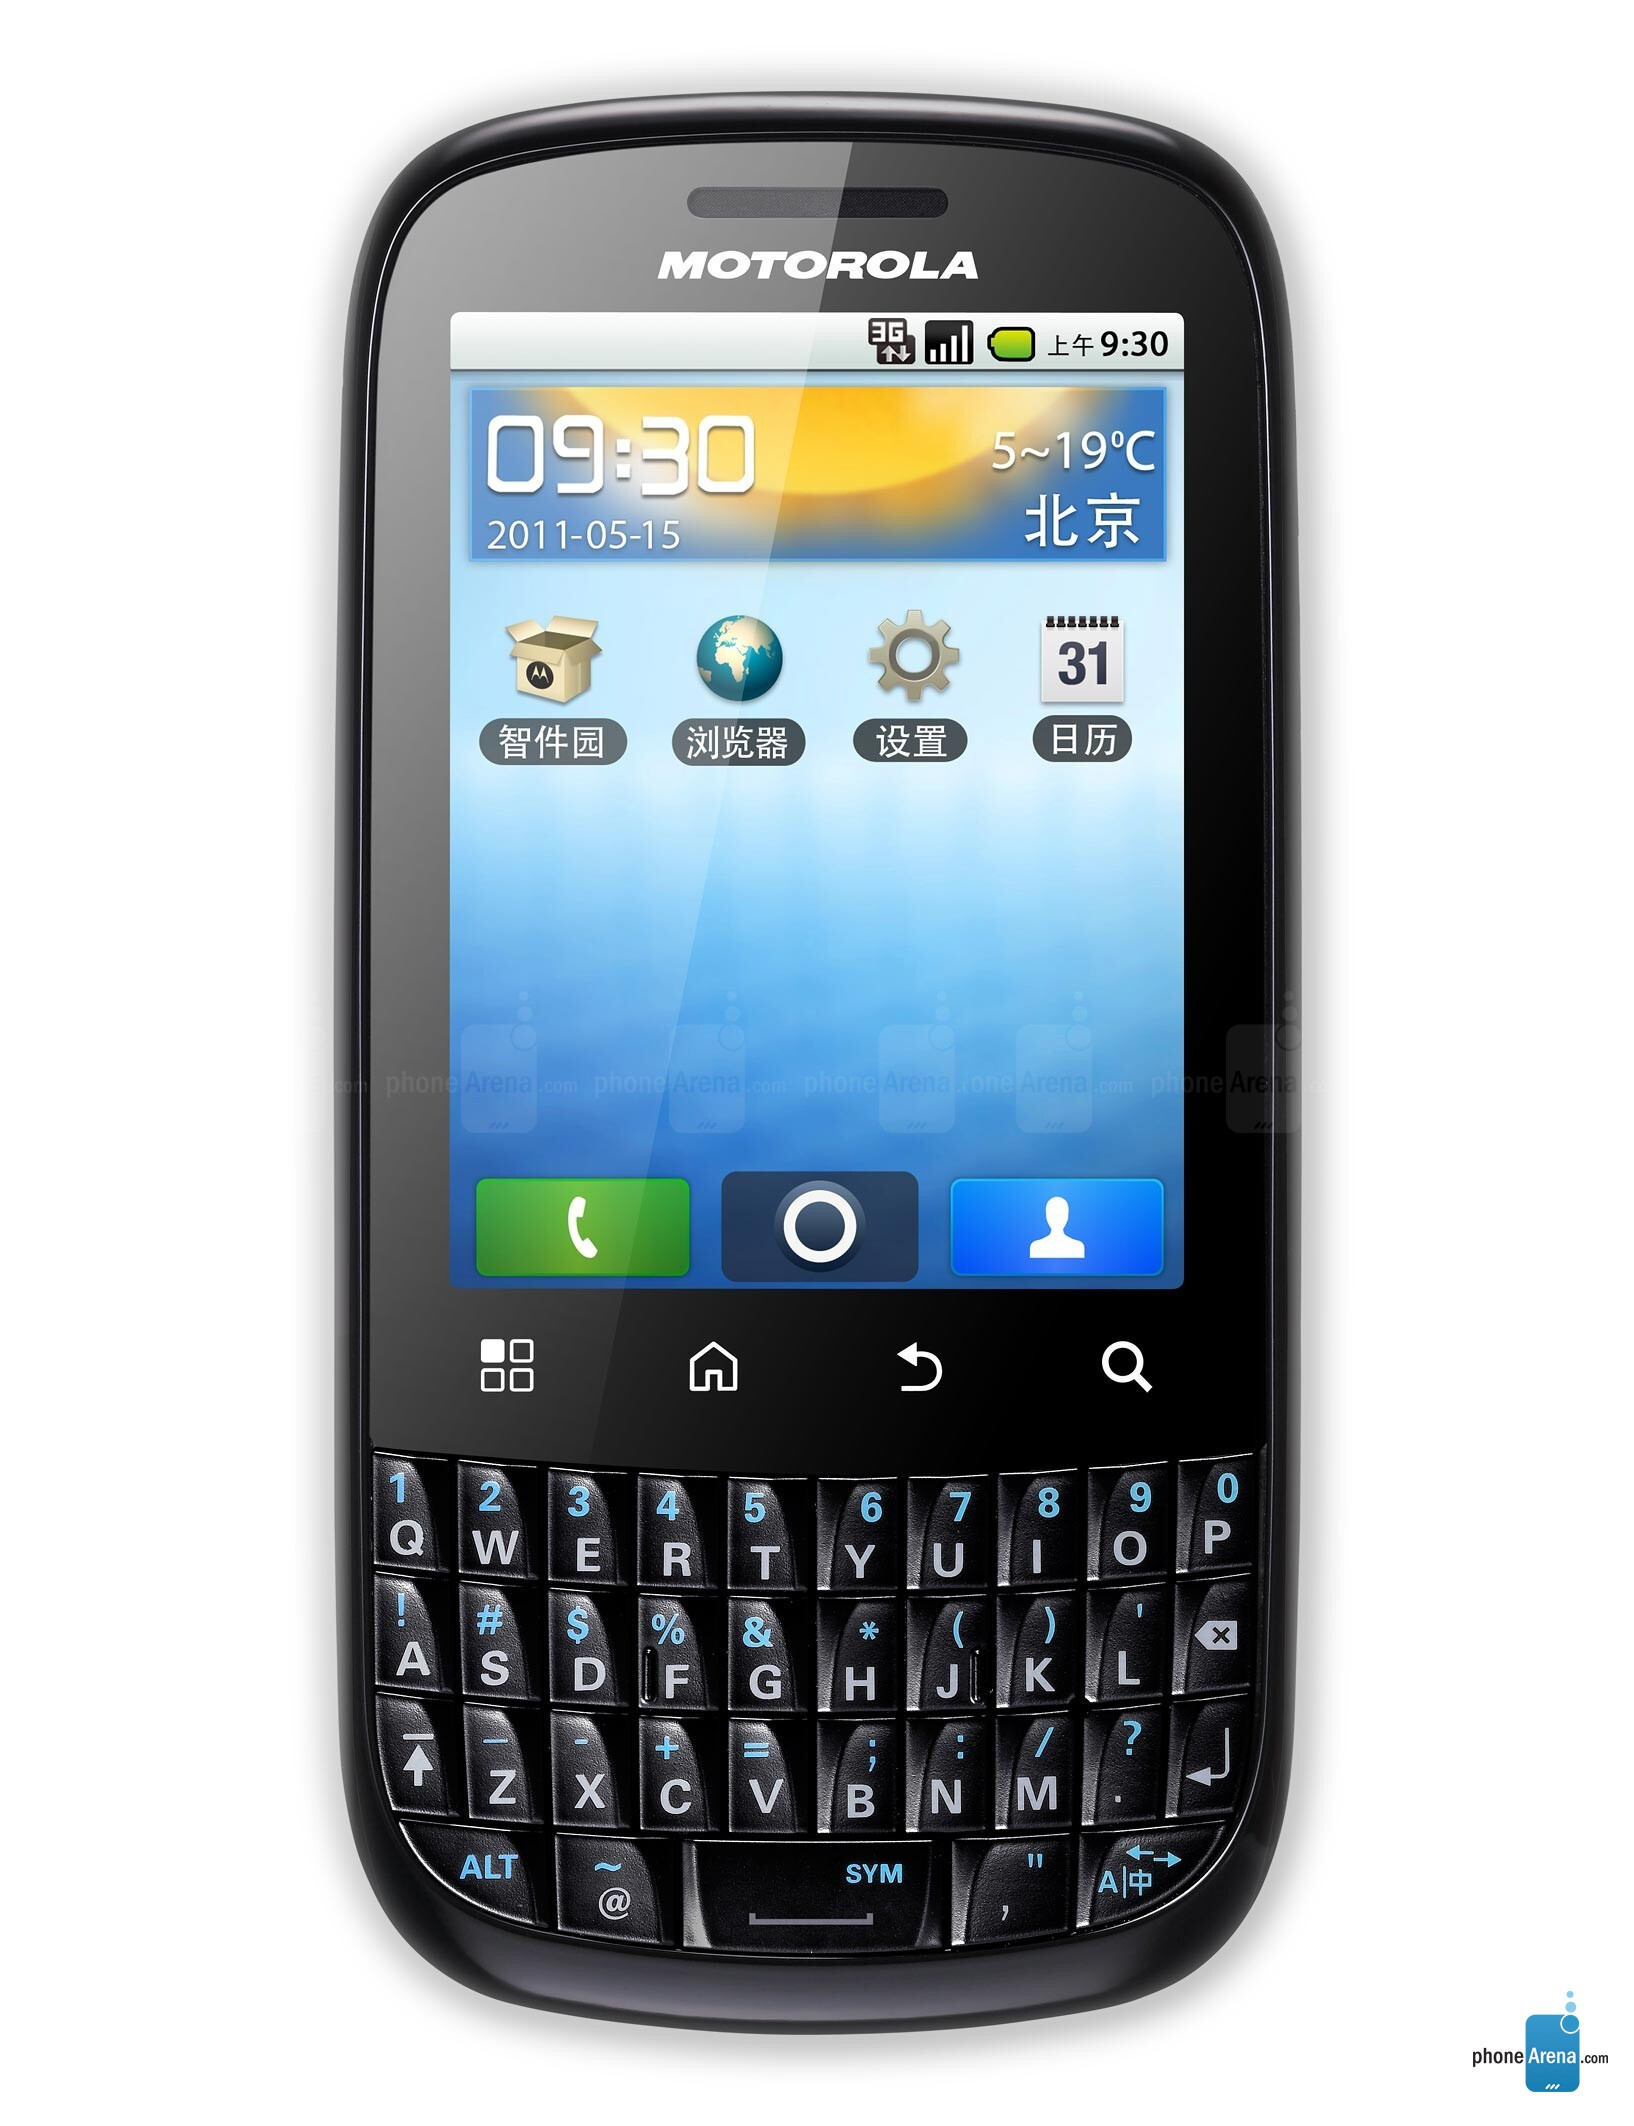 Motorola SPICE Key specs